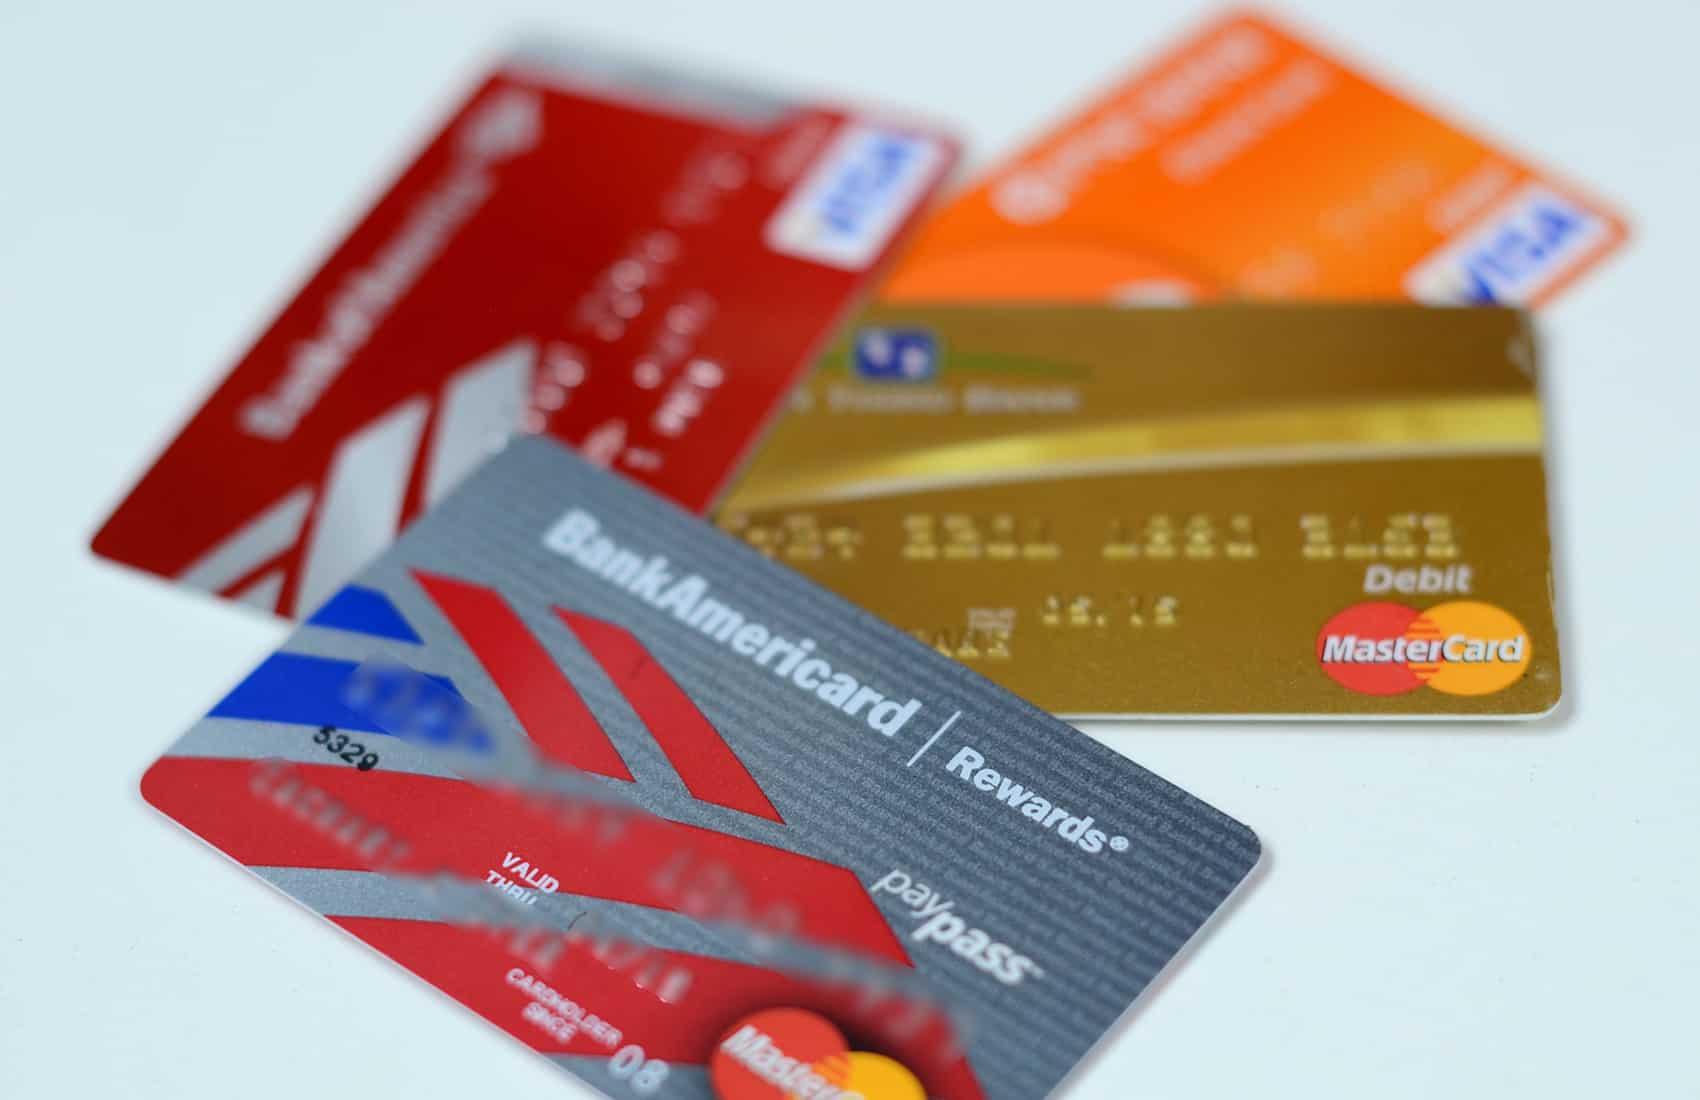 Credit, debit cards